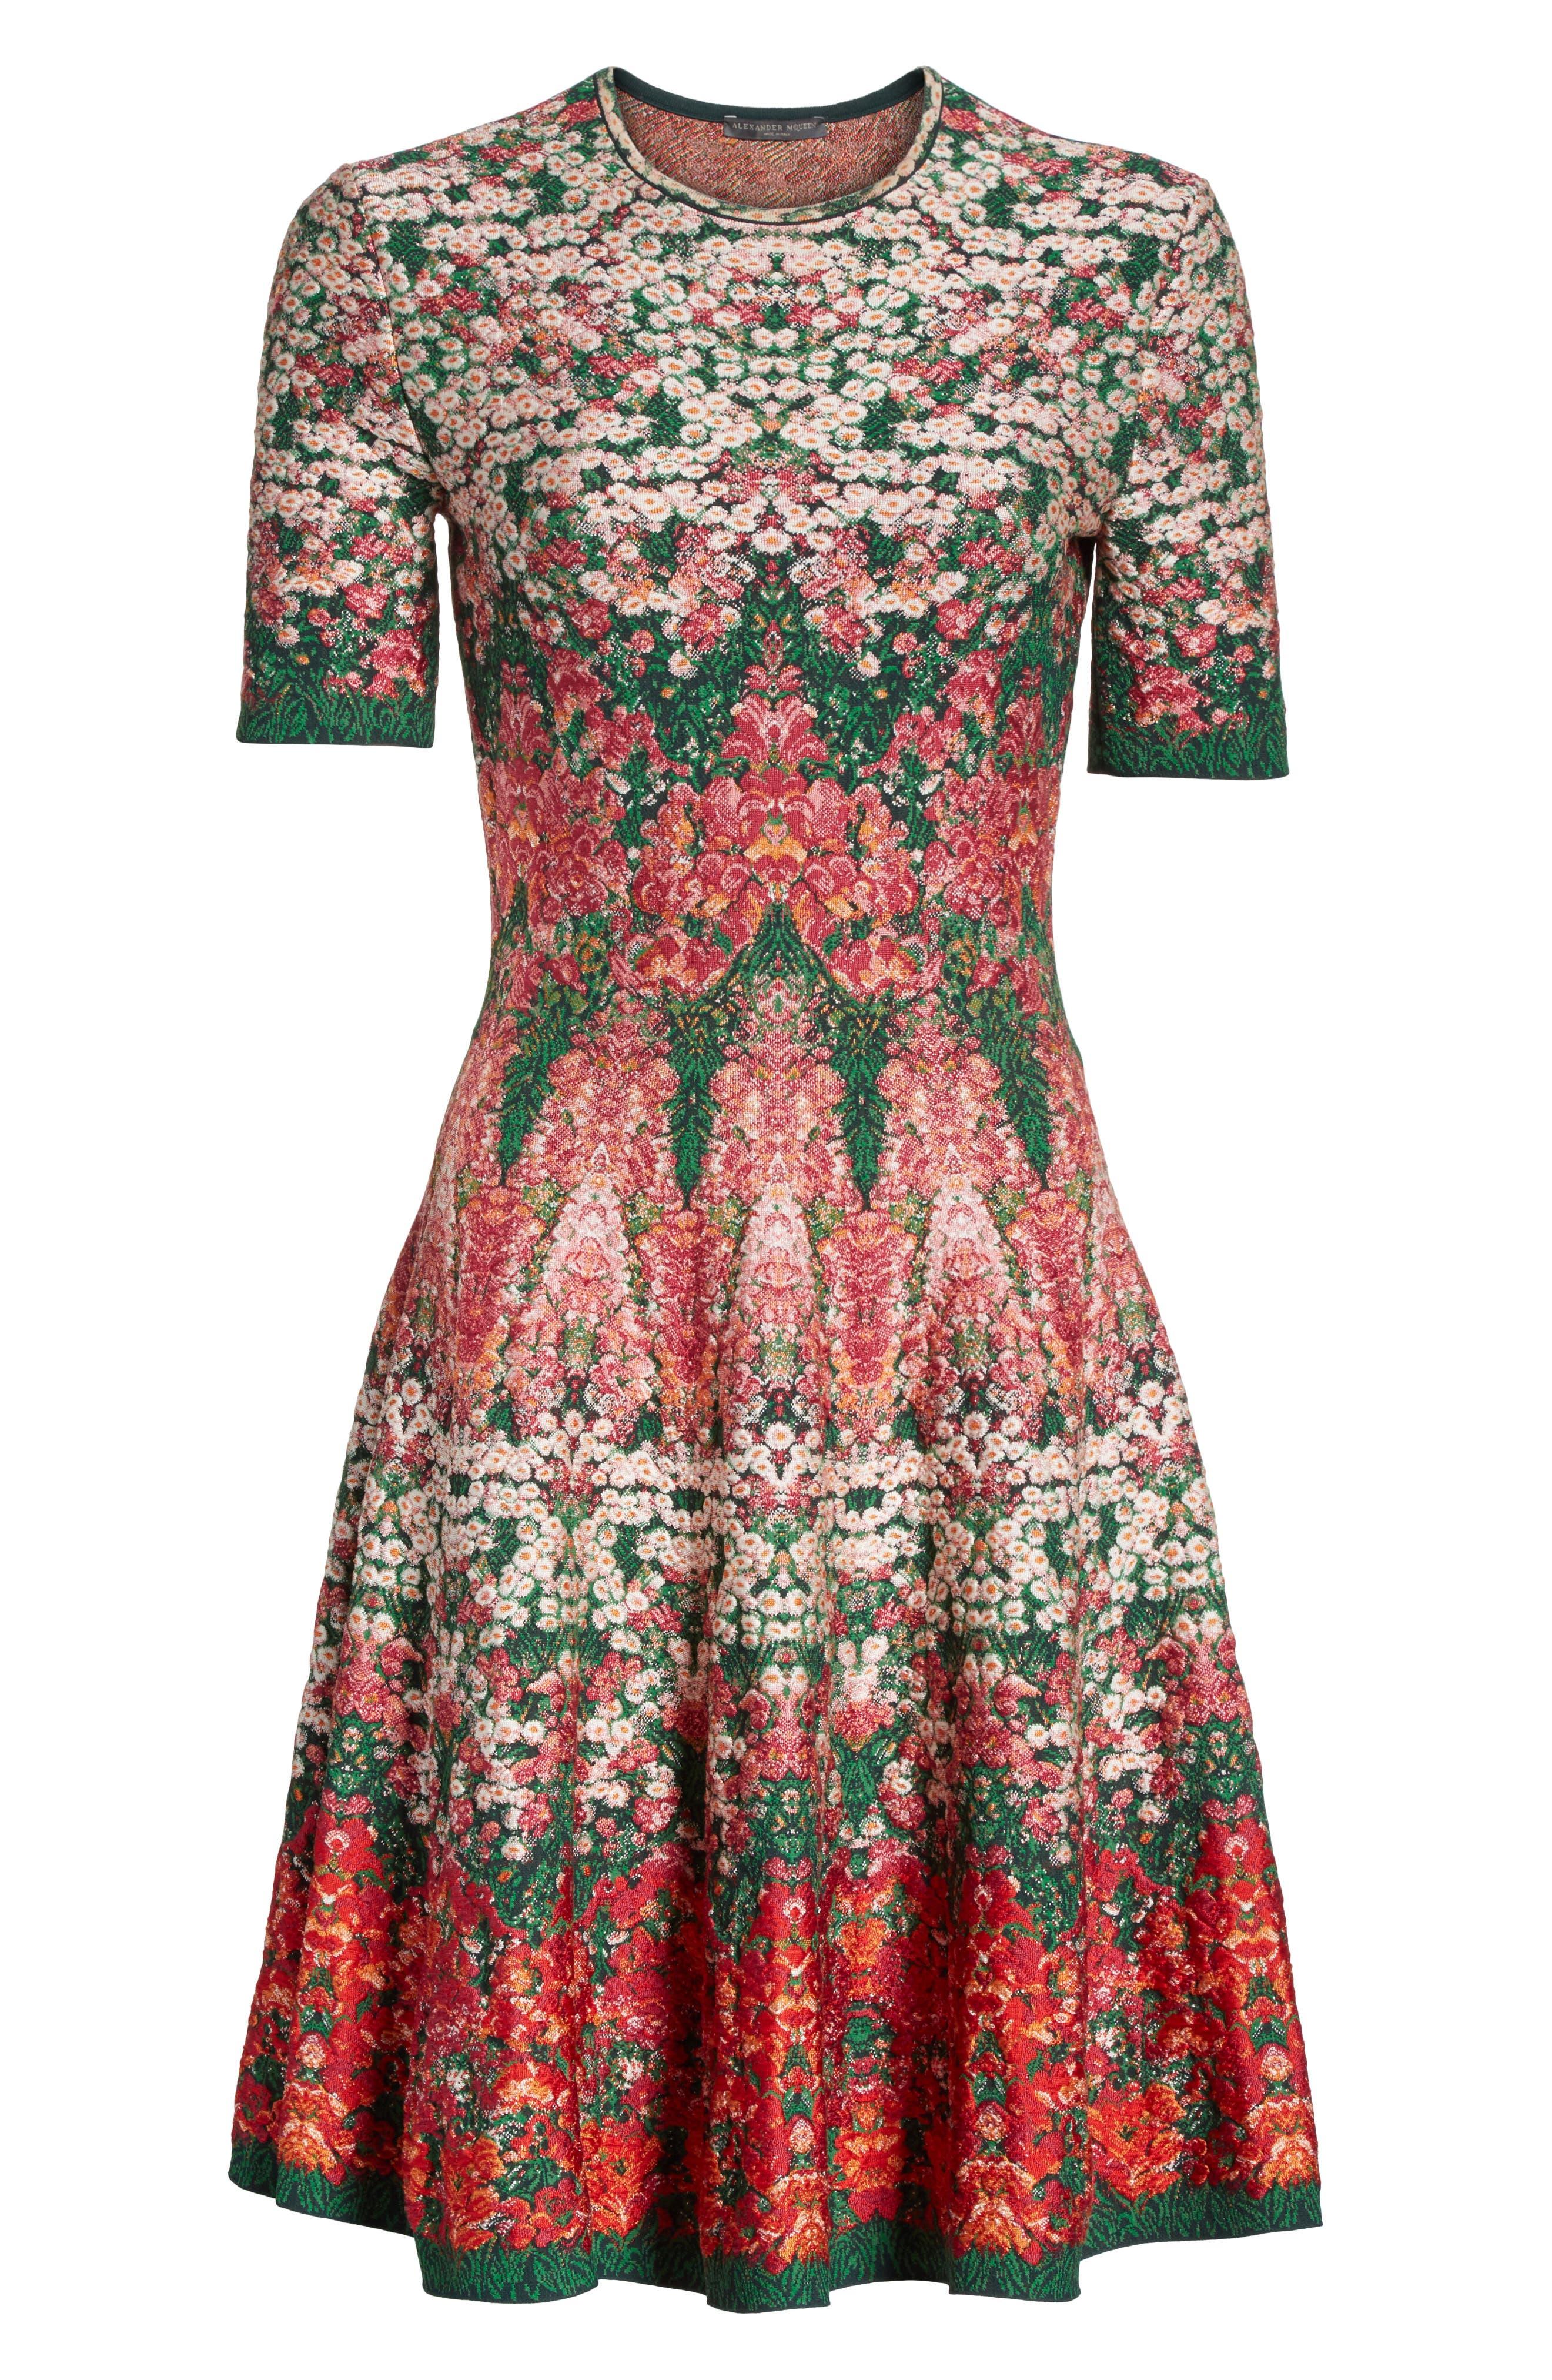 Floral Jacquard Knit Fit & Flare Dress,                             Alternate thumbnail 6, color,                             608